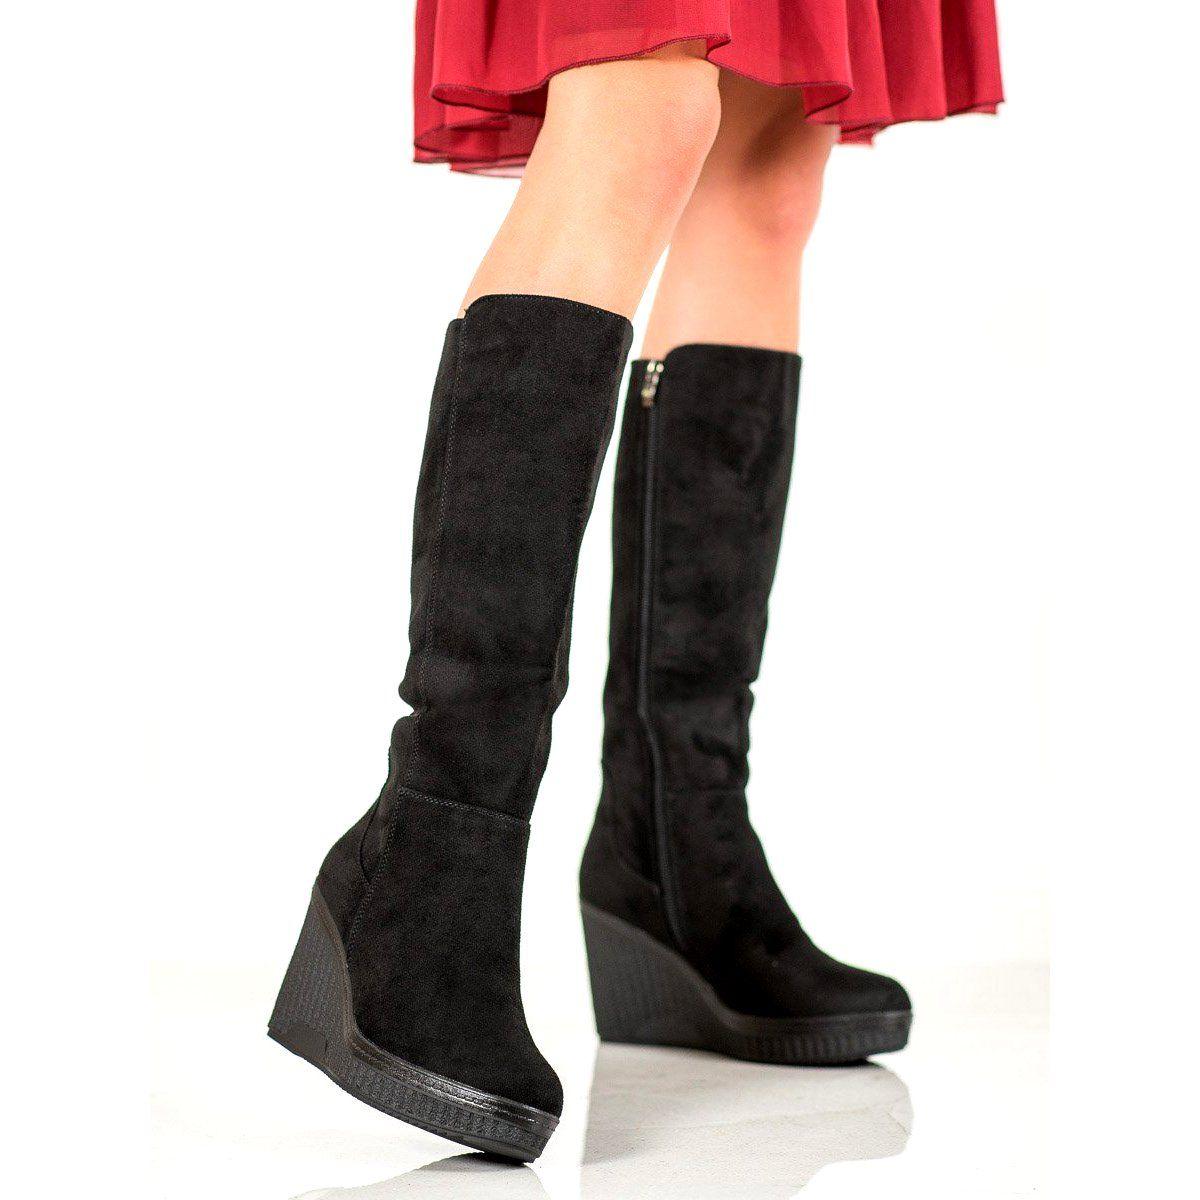 Filippo Czarne Kozaki Na Koturnie Wedge Boots Black Wedge Boots Boots